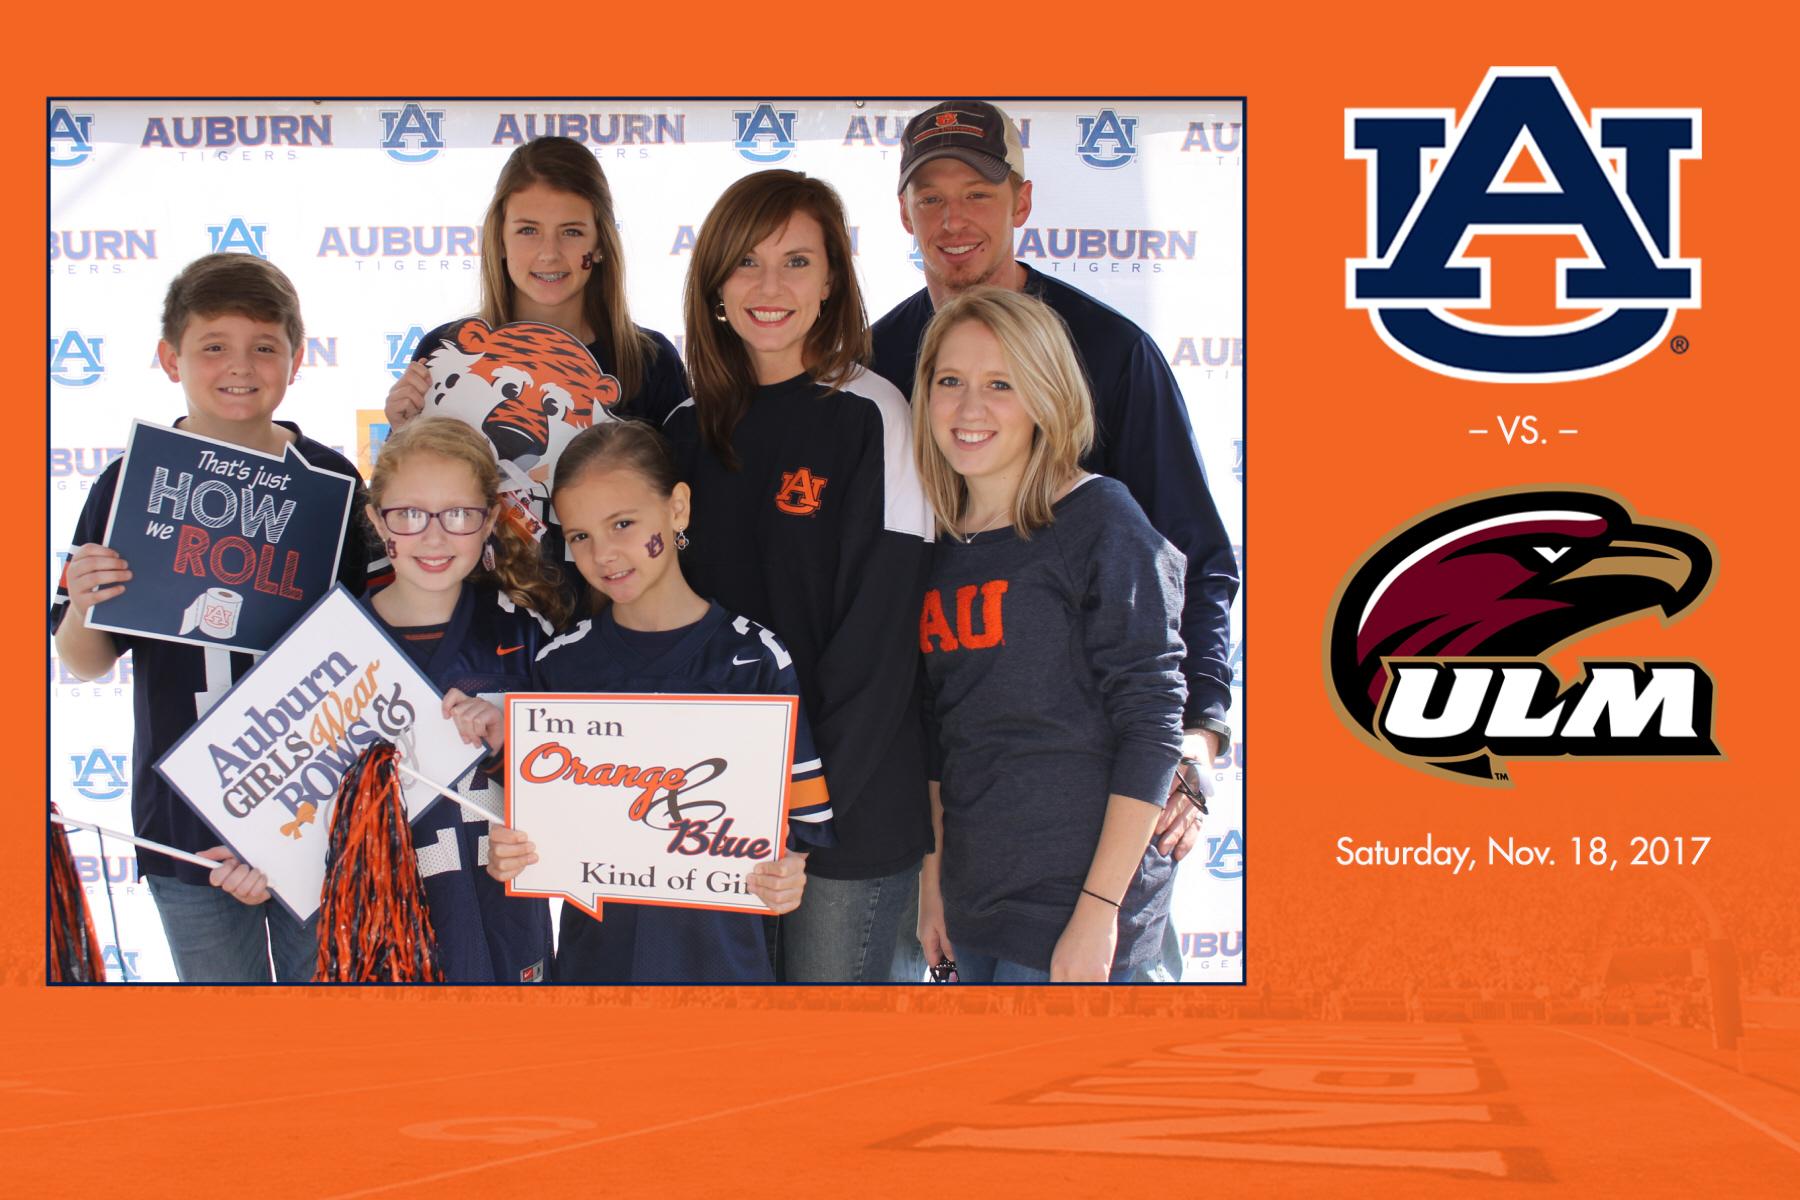 Auburn vs ULM